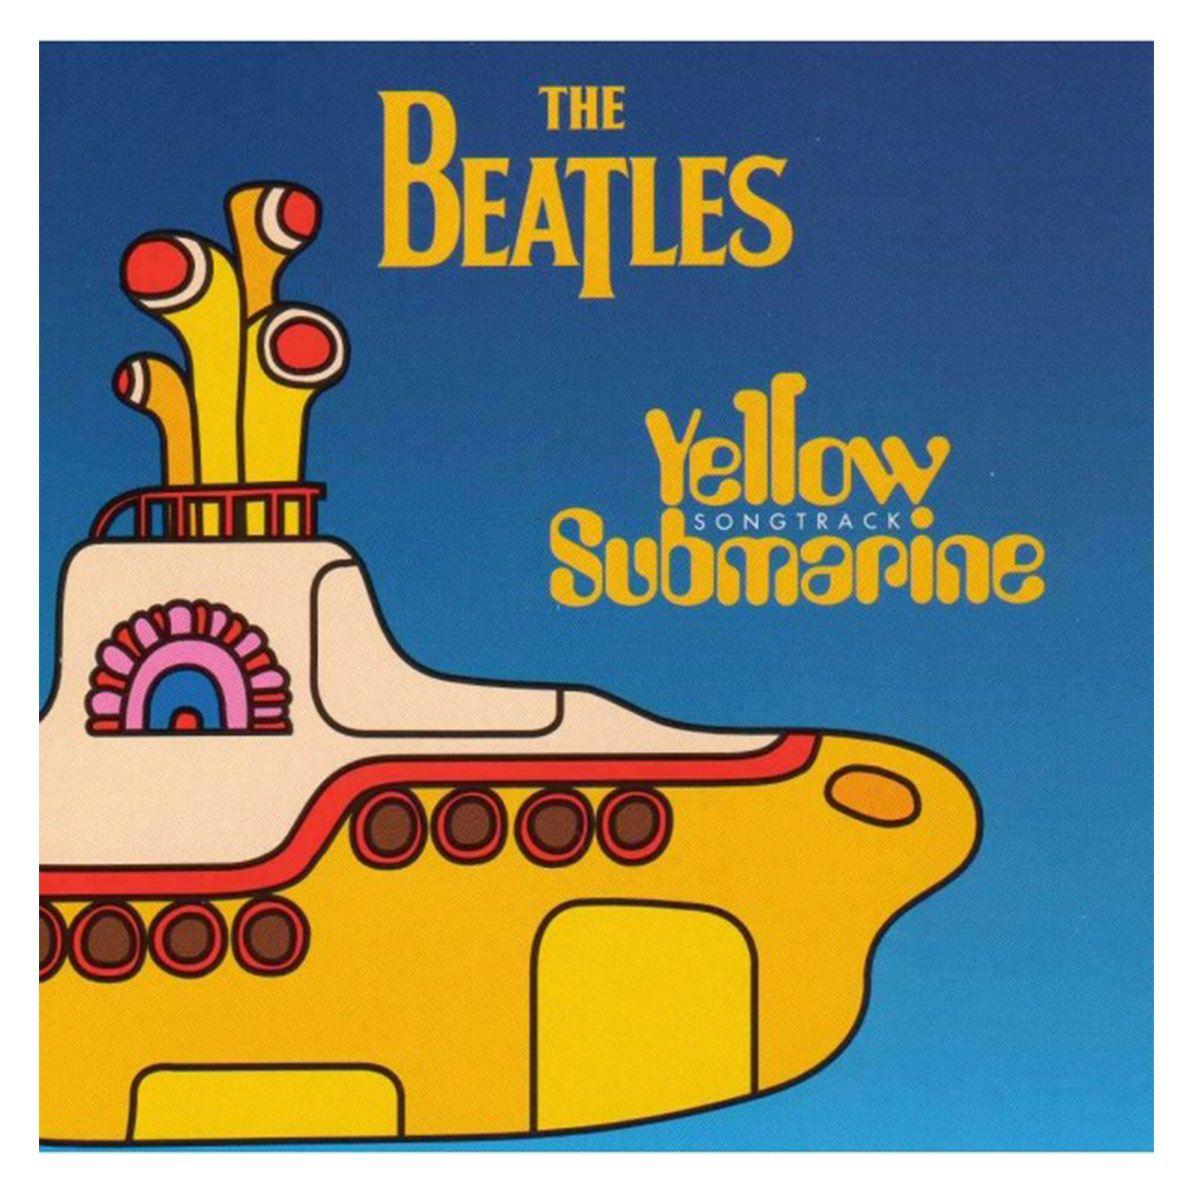 LP The Beatles - Yellow Submarine Songtrack